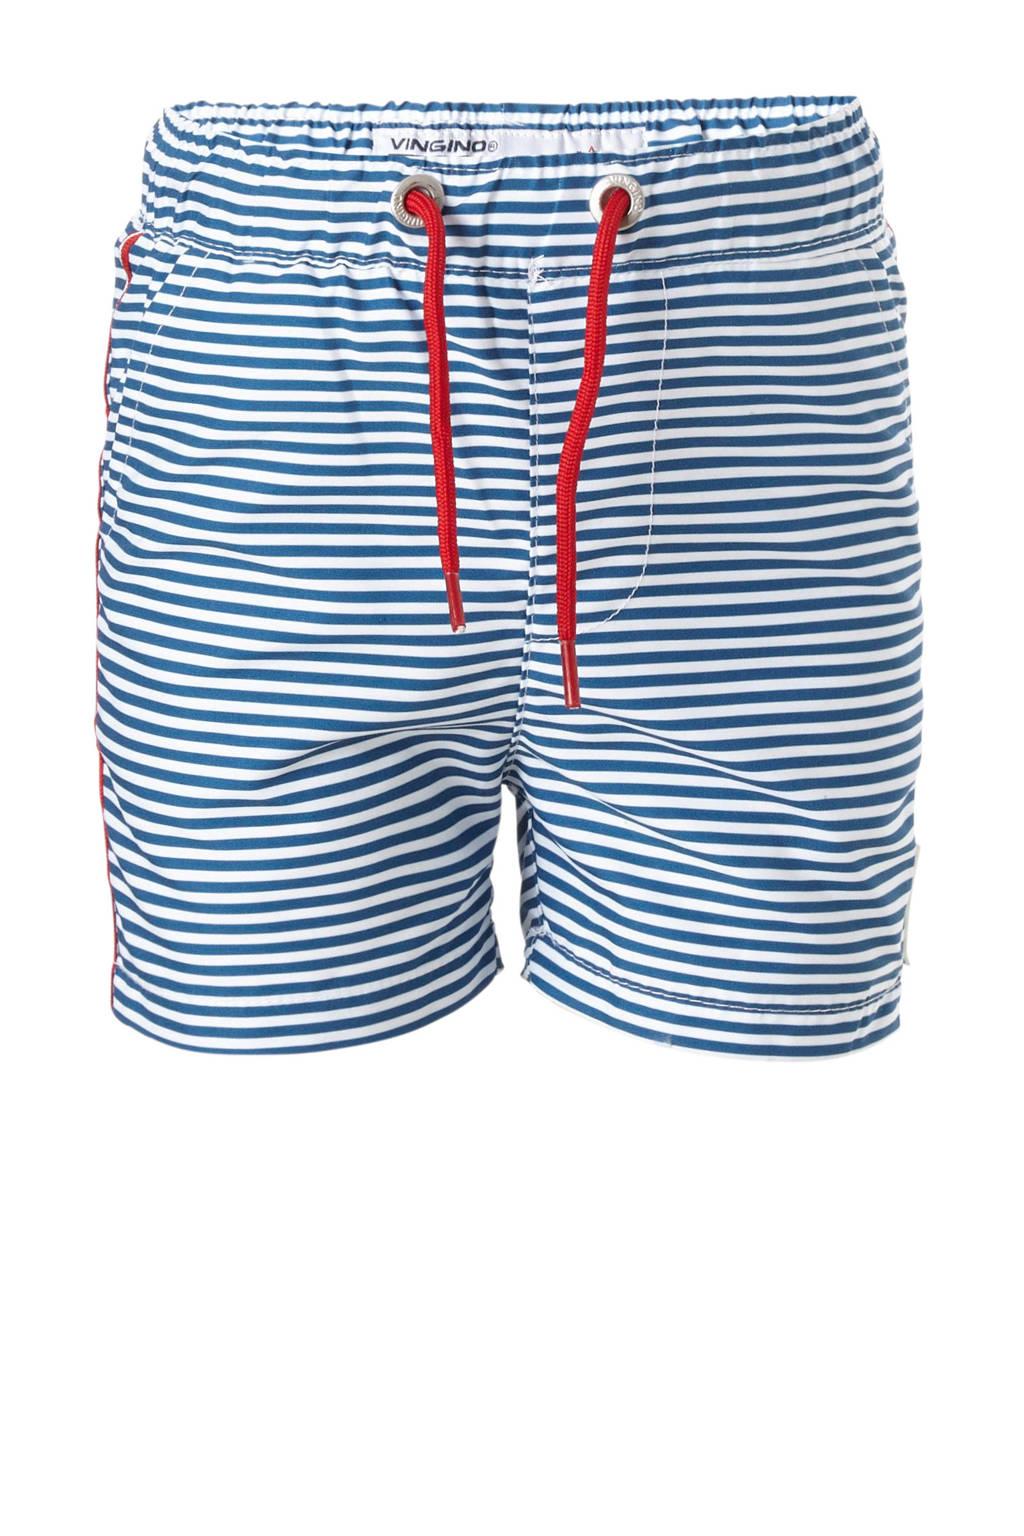 Vingino gestreepte zwemshort blauw, Blauw/wit